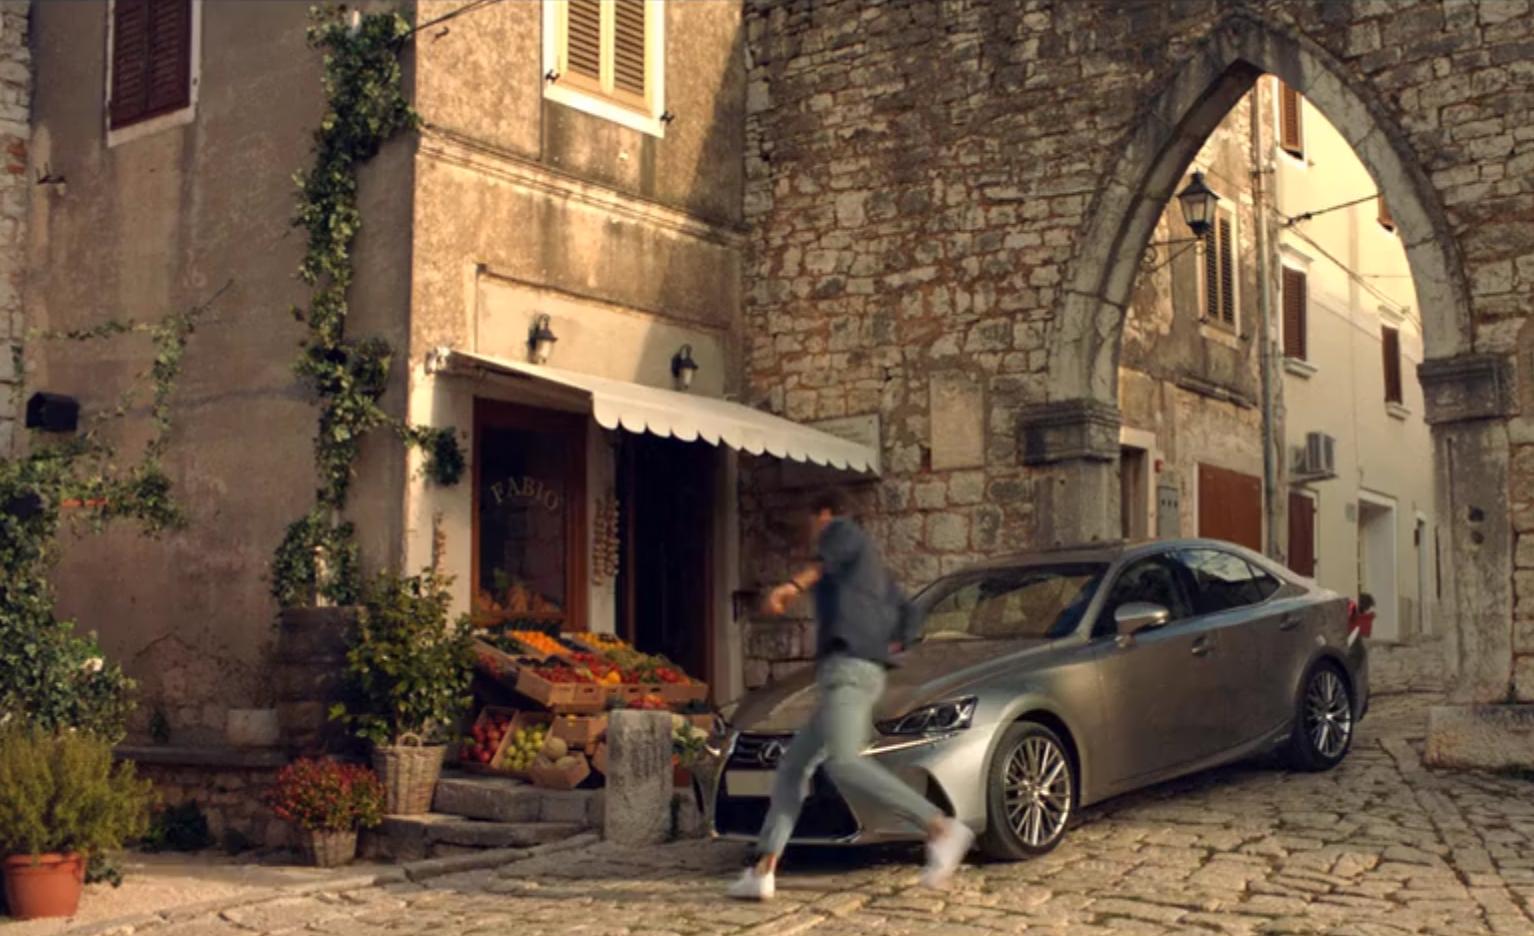 commercial: anniversary - mam.art, slovenian production design company